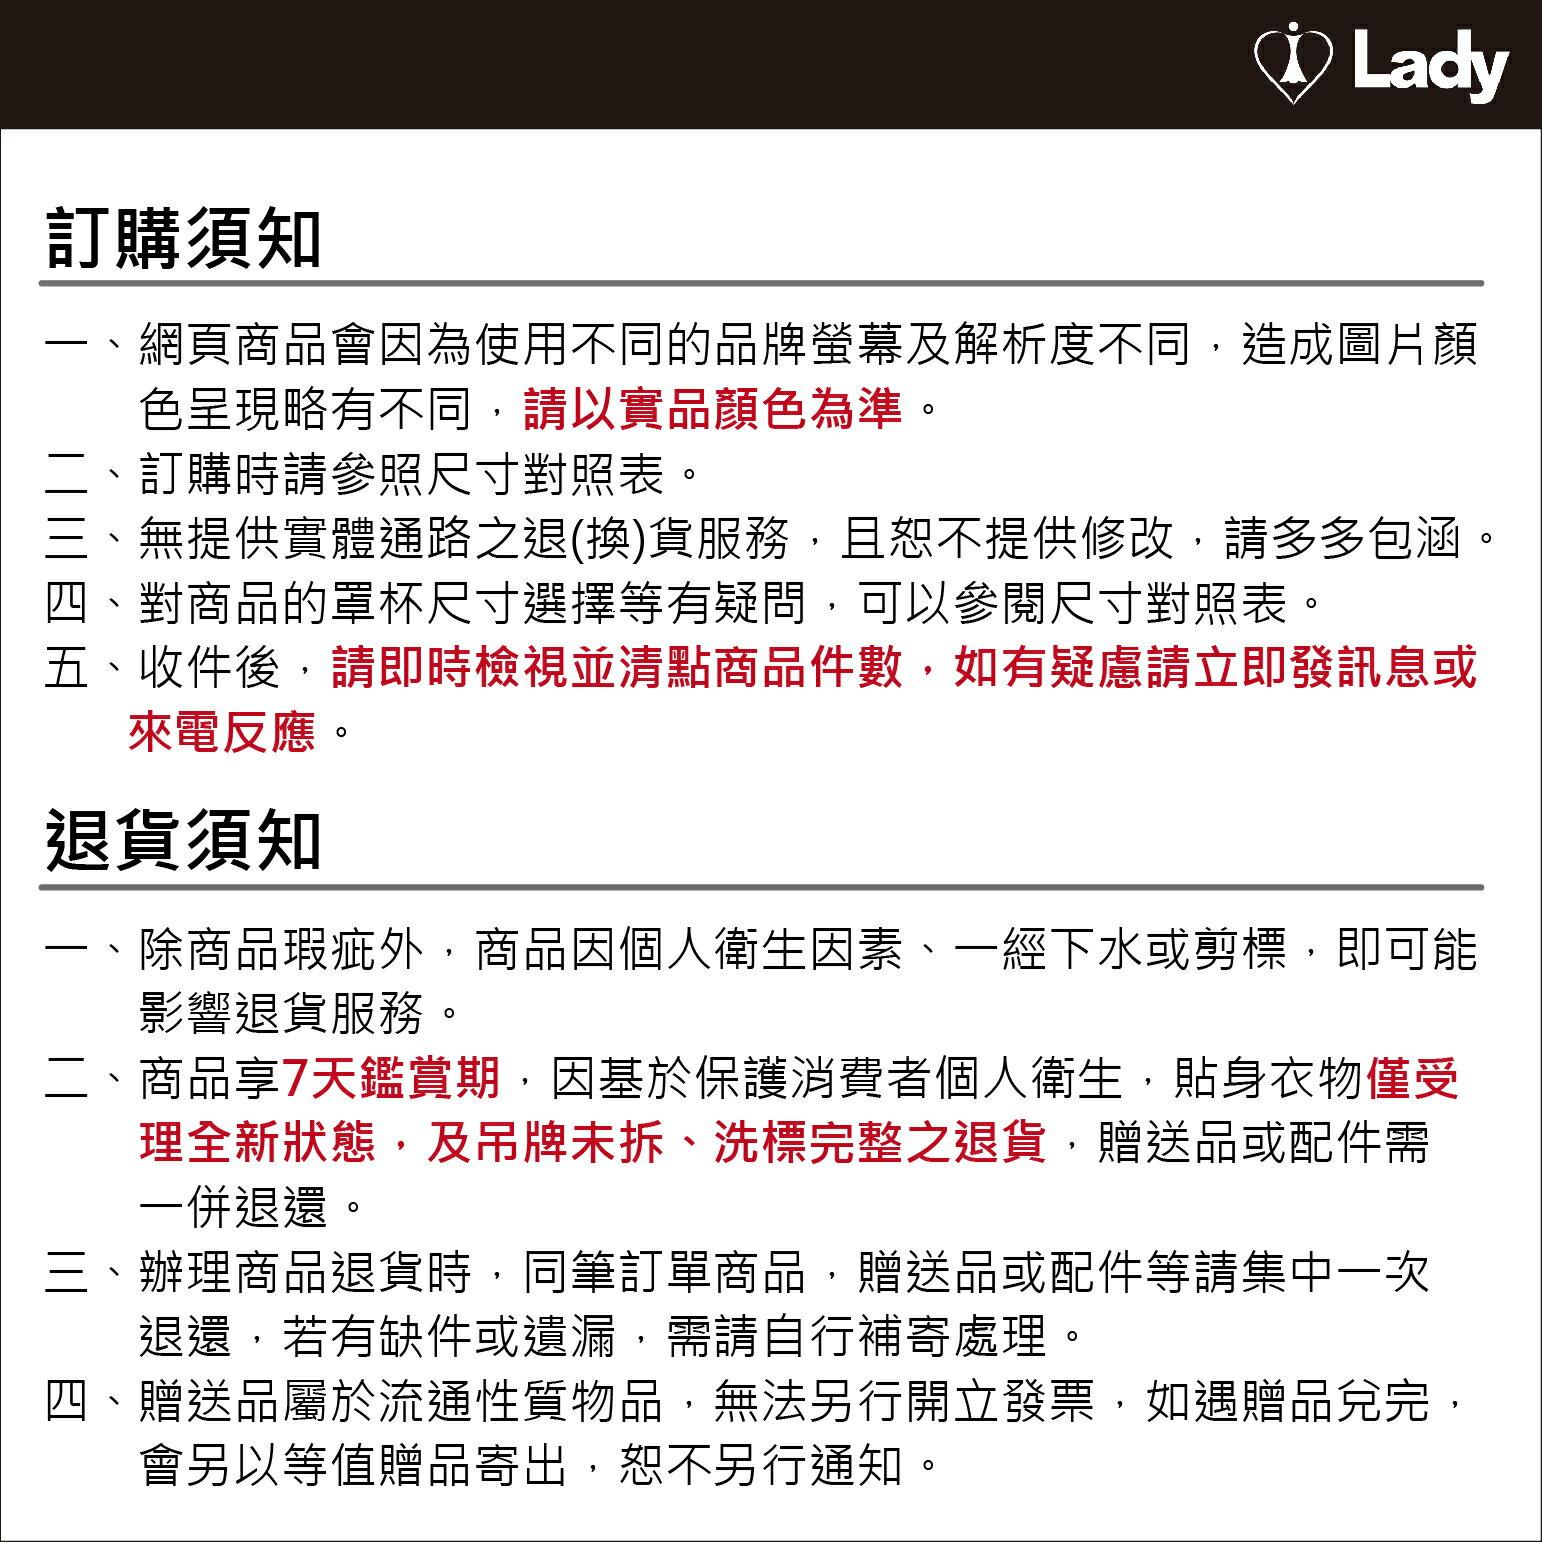 Lady許願花藤系列 G罩 機能調整型內衣(珊瑚橘)【不附襯墊】 7